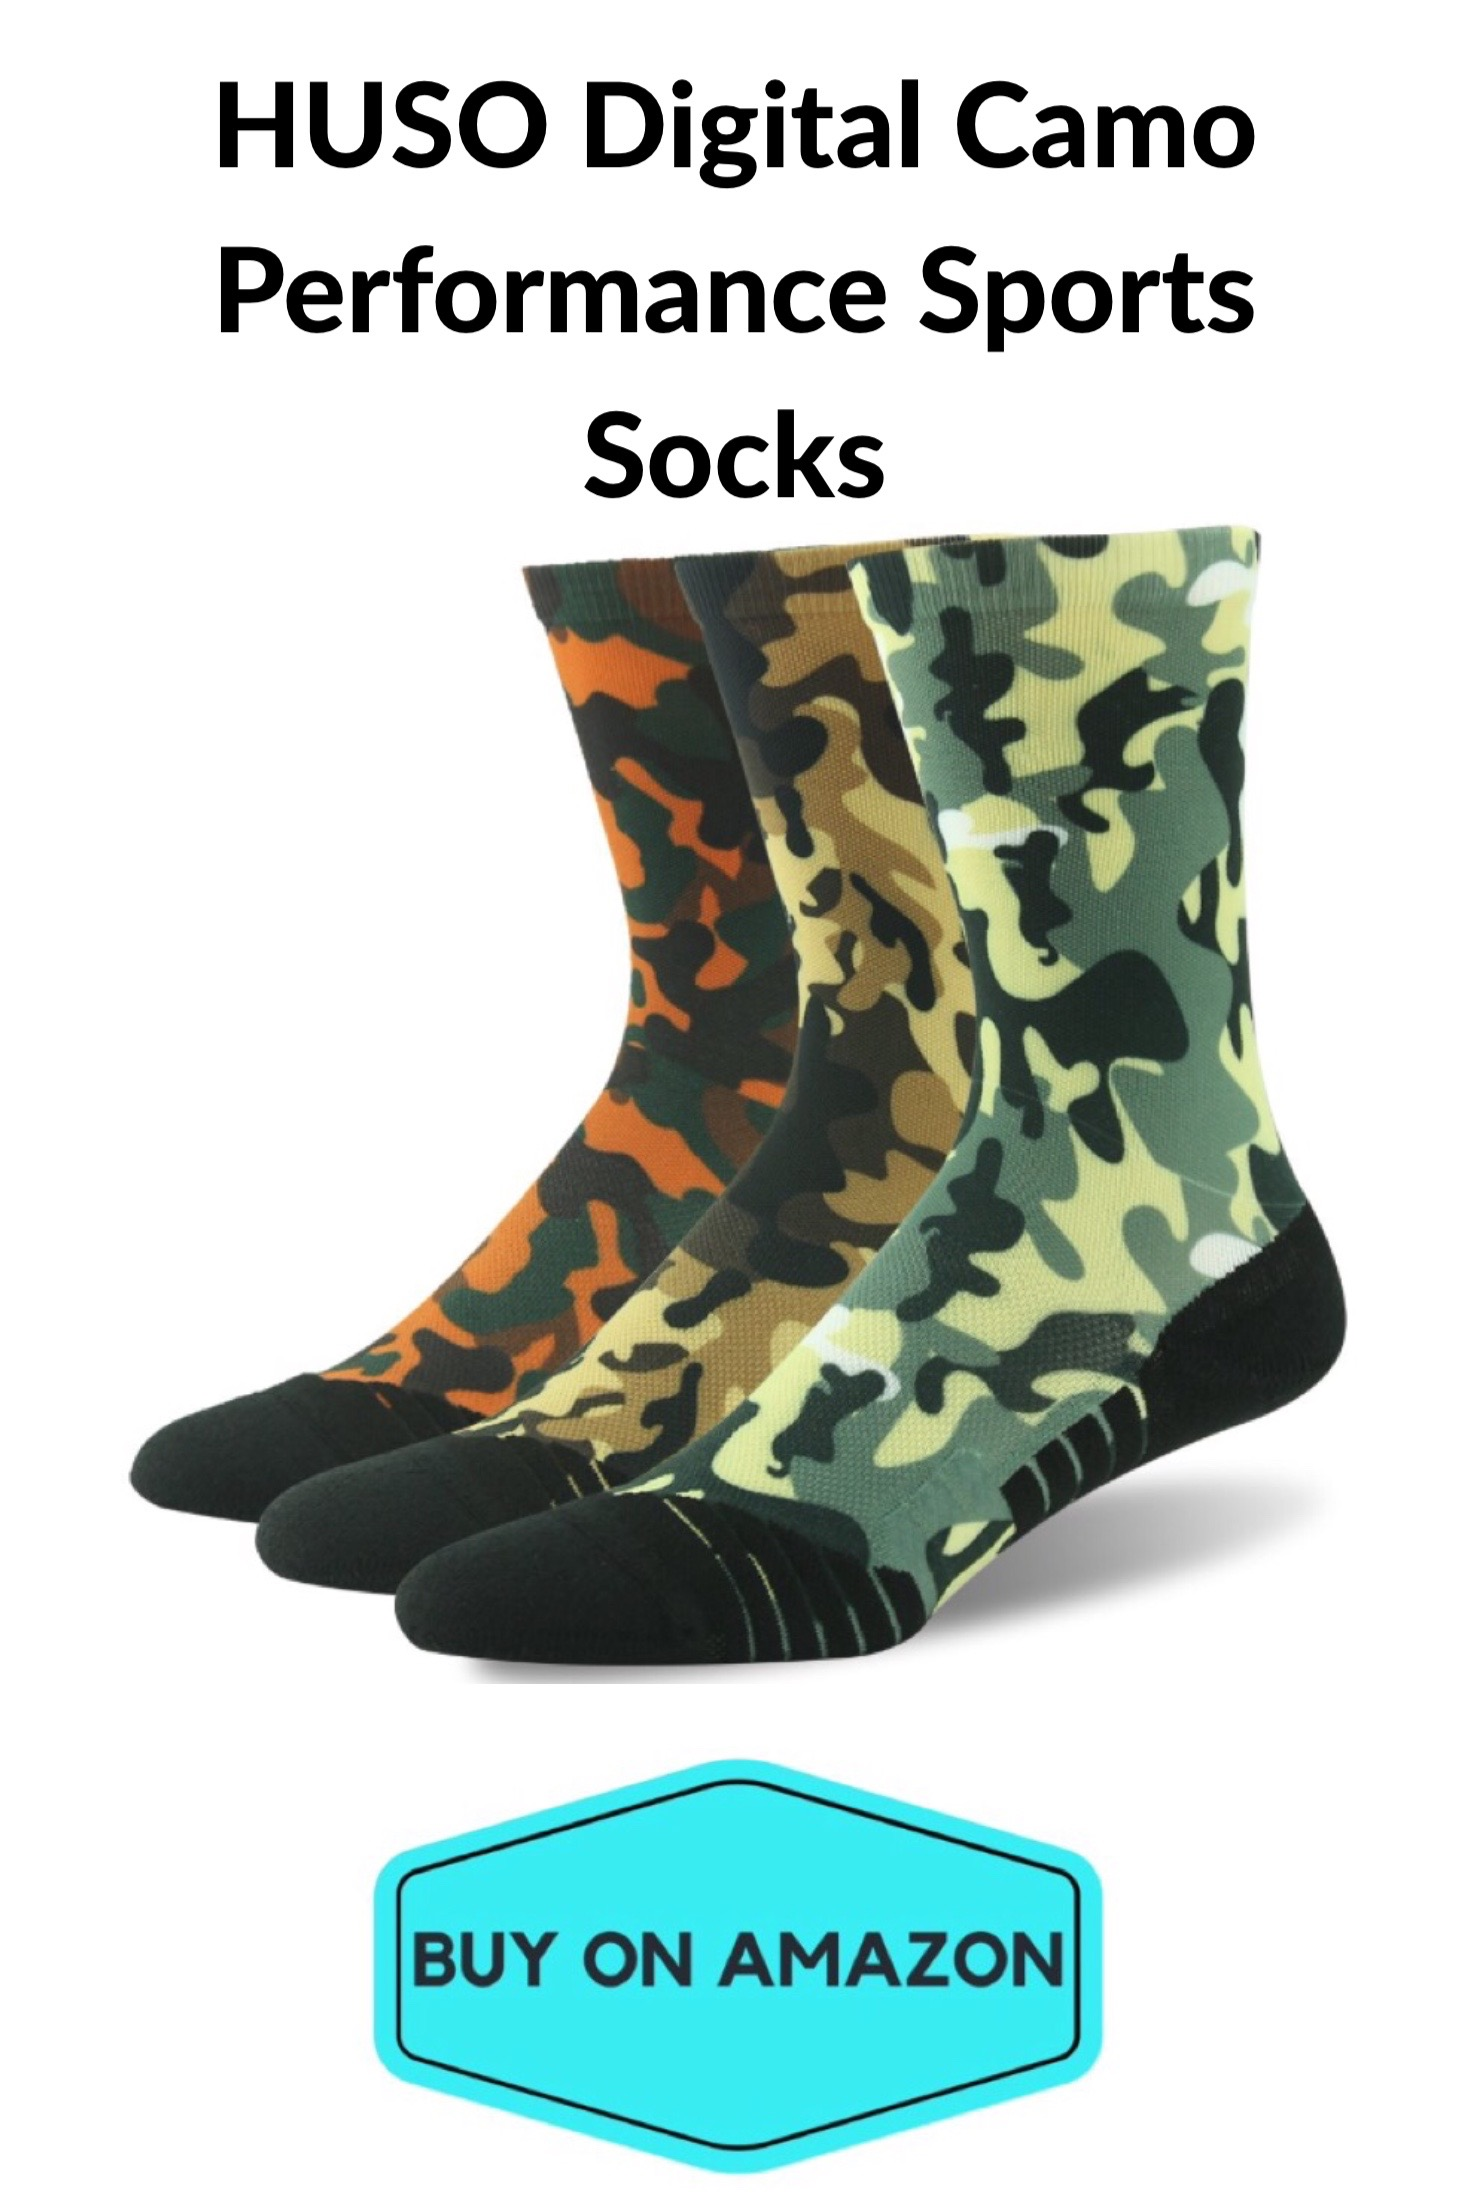 HUSO Digital Camo Sports Socks